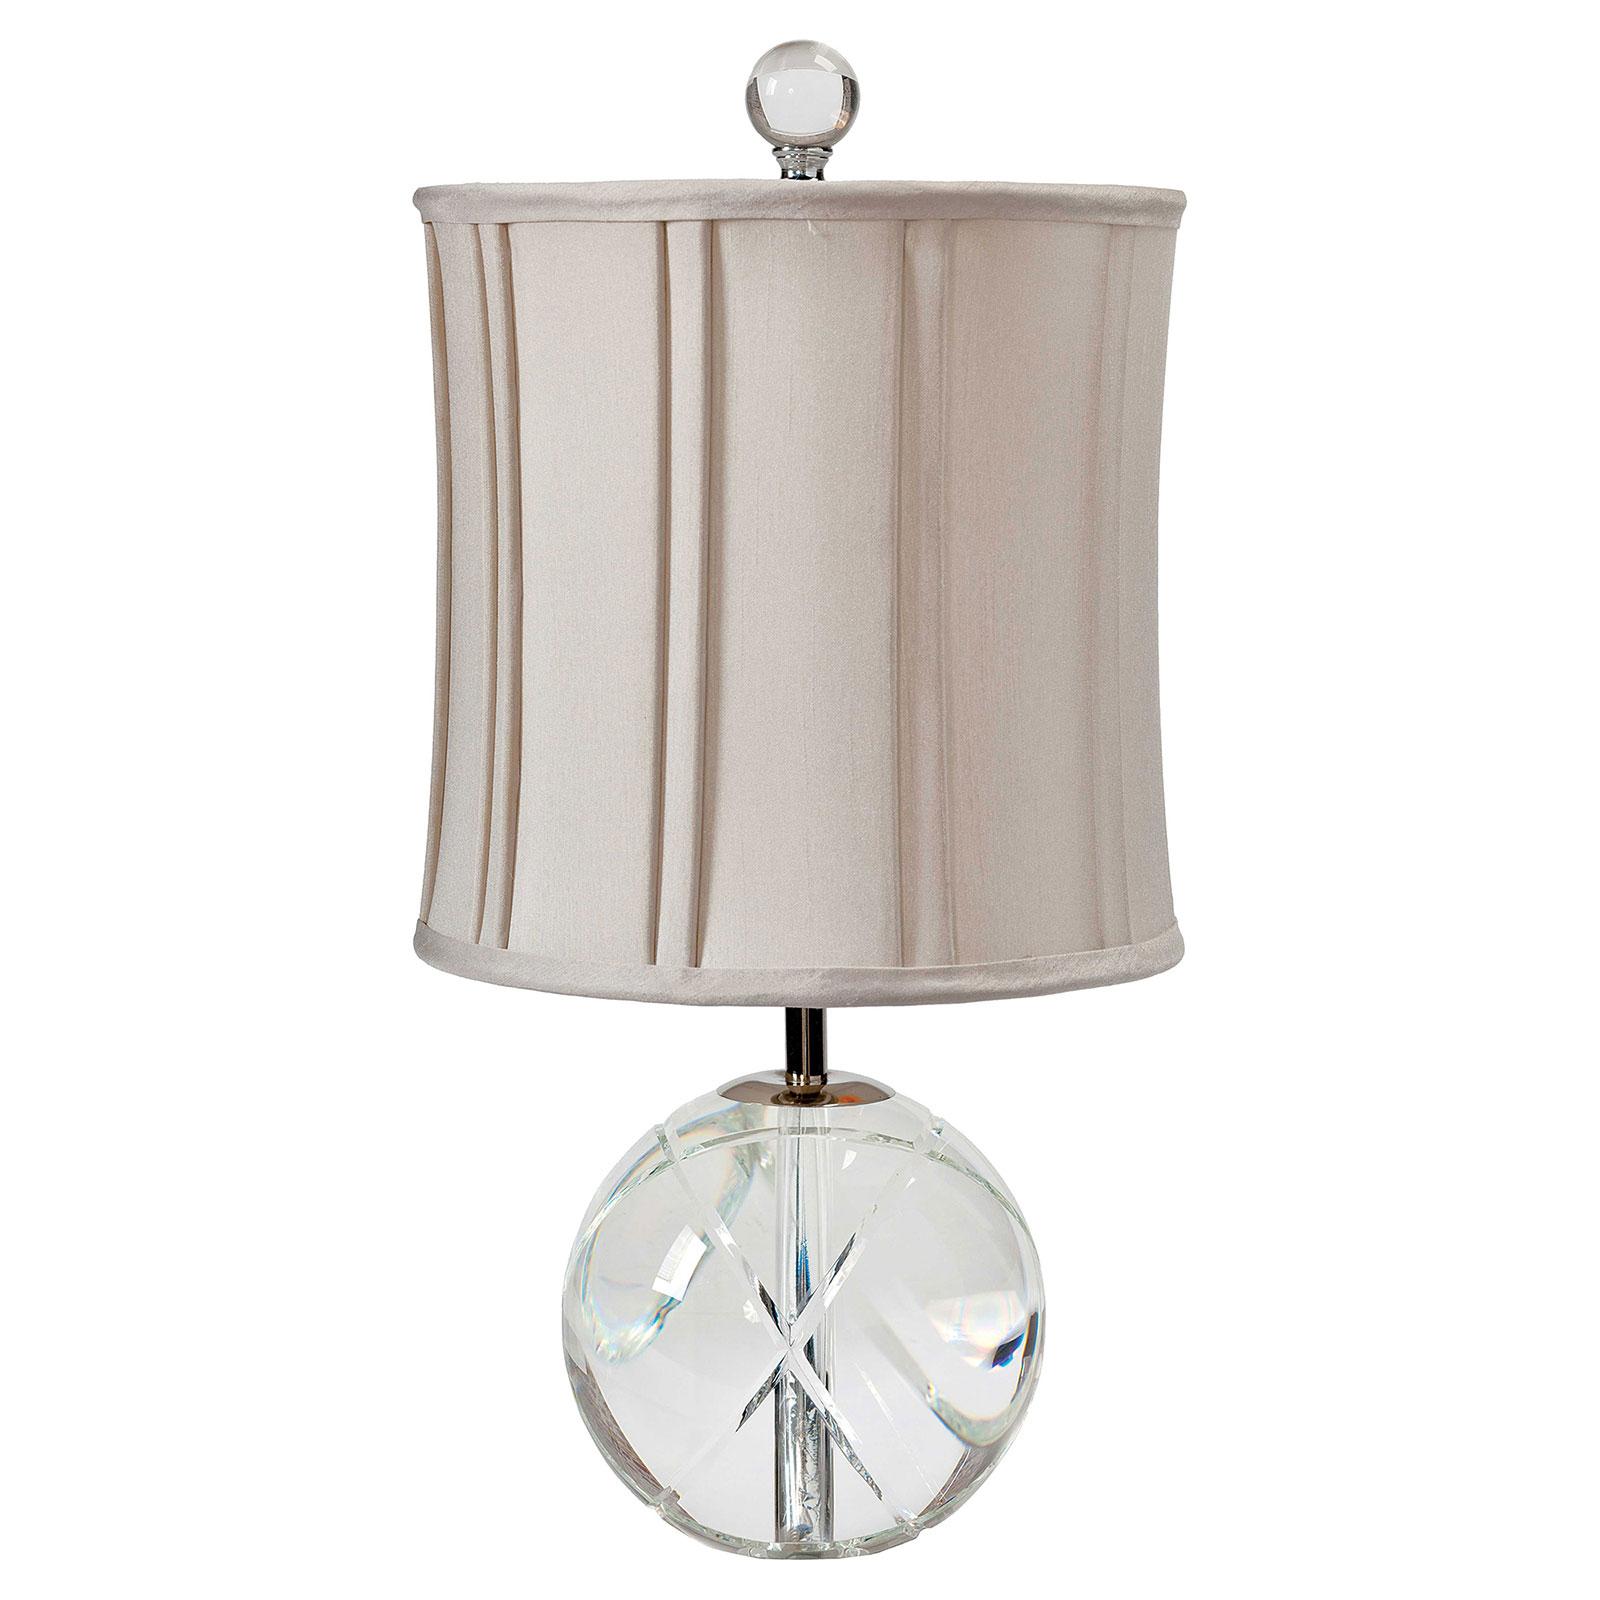 Blain Modern Crystal Sphere Pleat Shade Mini Lamp